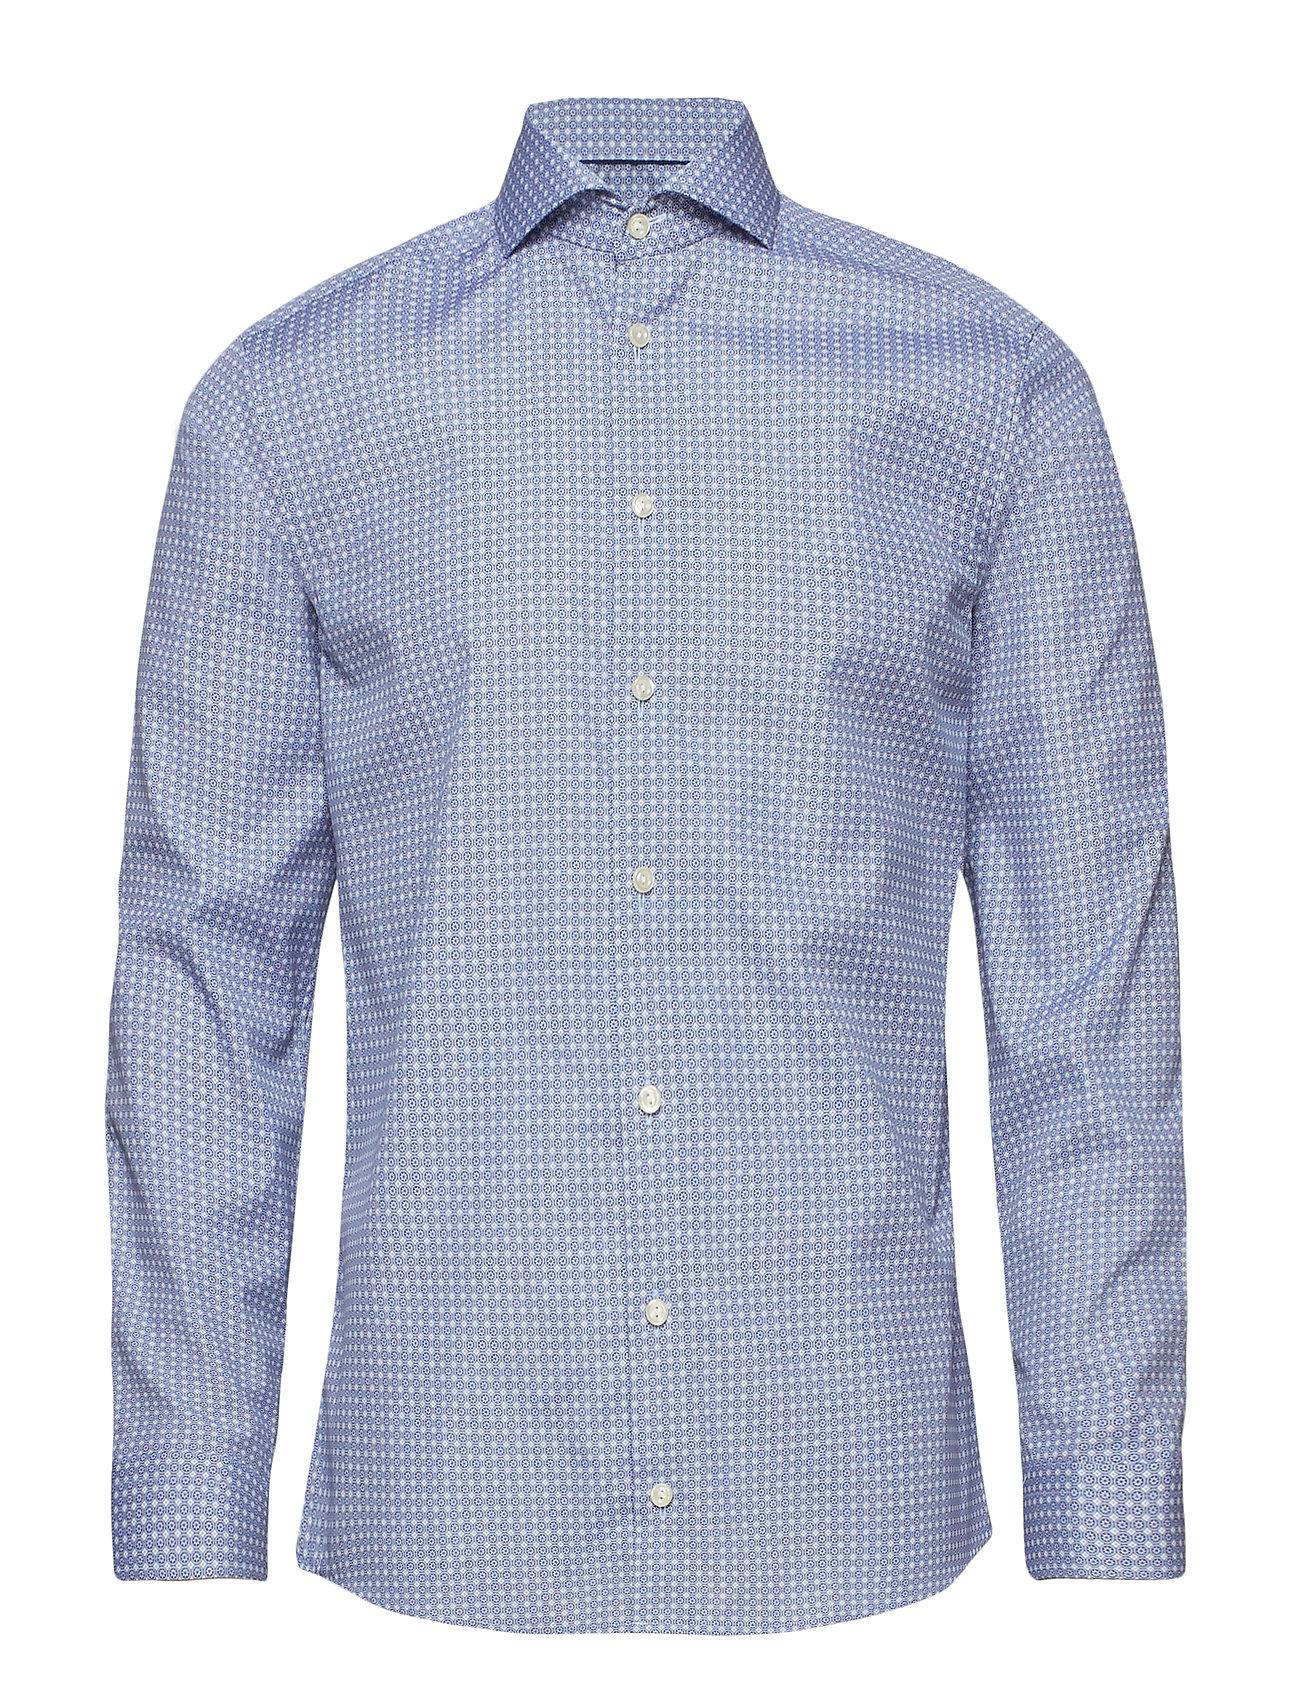 Eton Navy Geometric Print Shirt